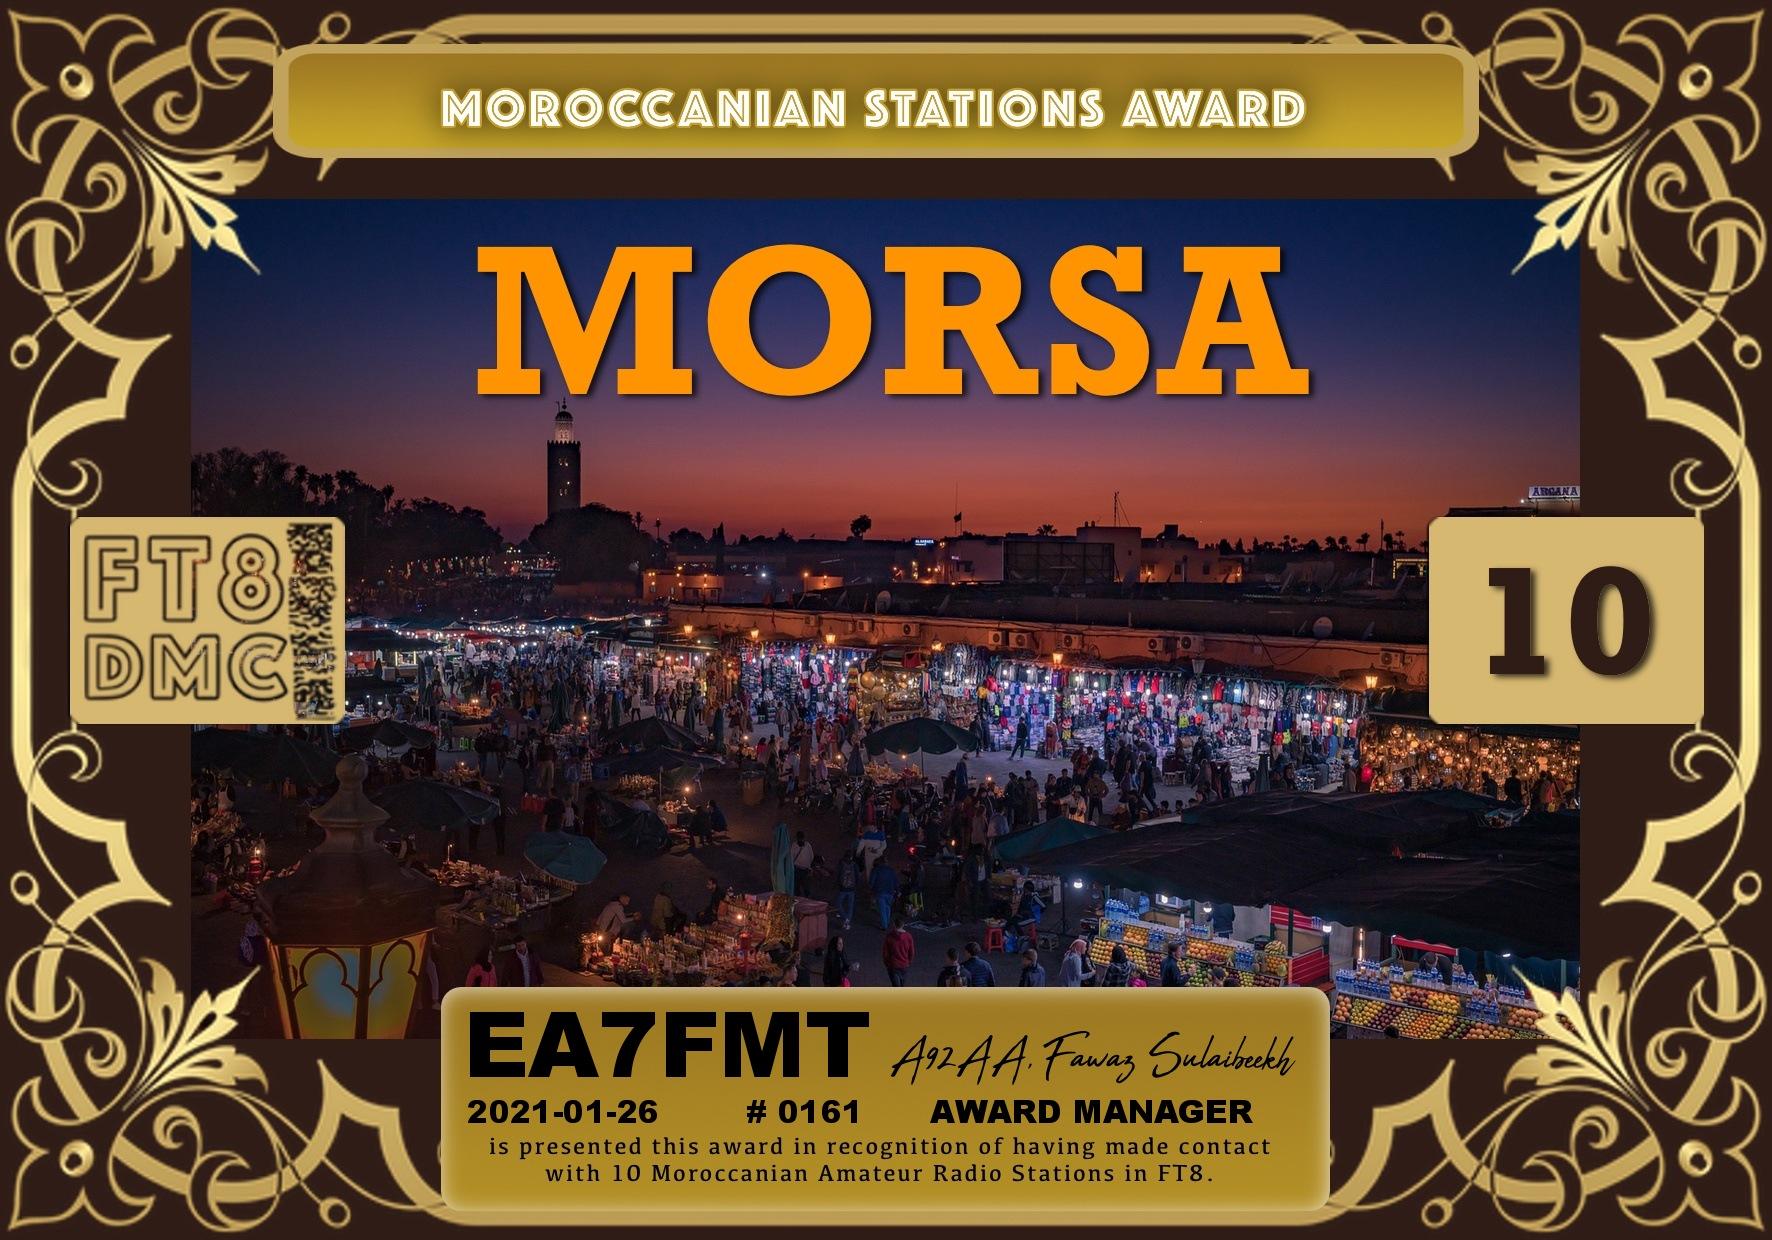 MORSA-10_FT8DMC